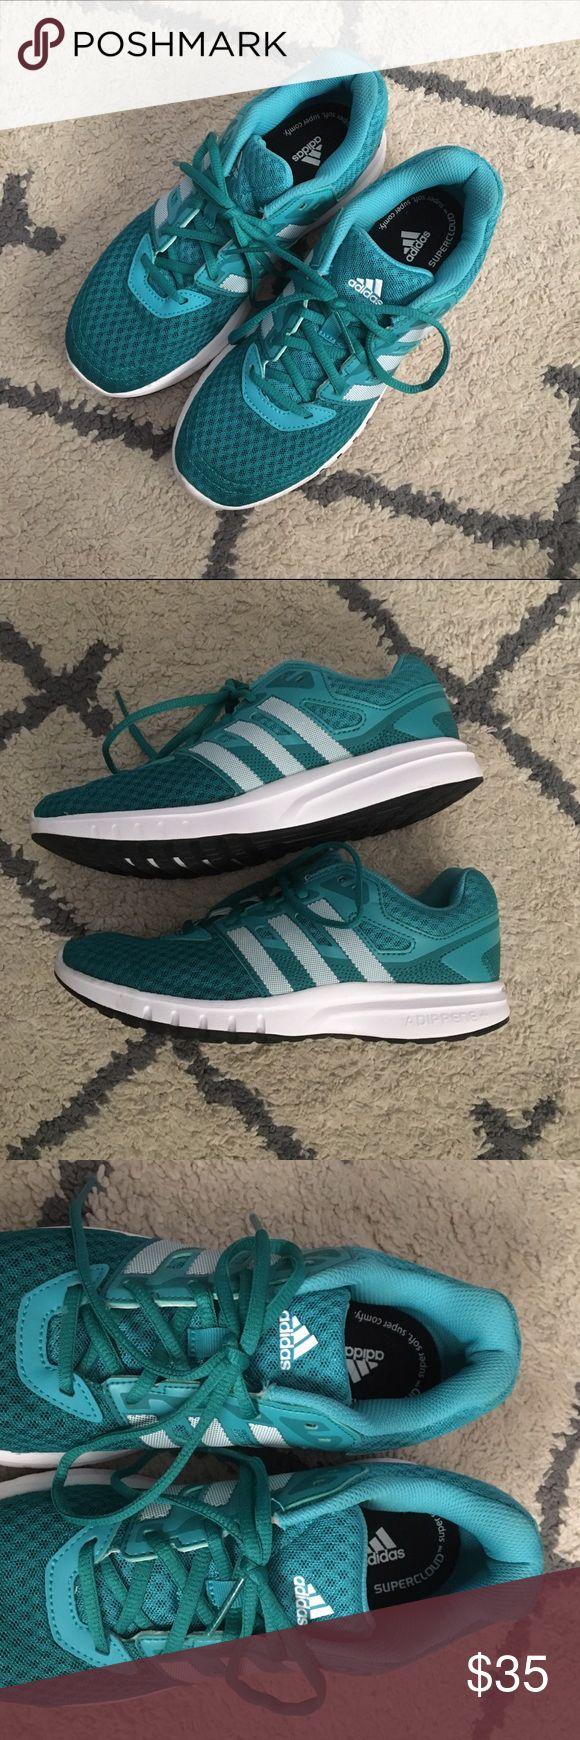 Women's Adidas Adiprene Great condition. Women's Adidas Adiprene. Color teal. Running shoes. Adidas Shoes Sneakers